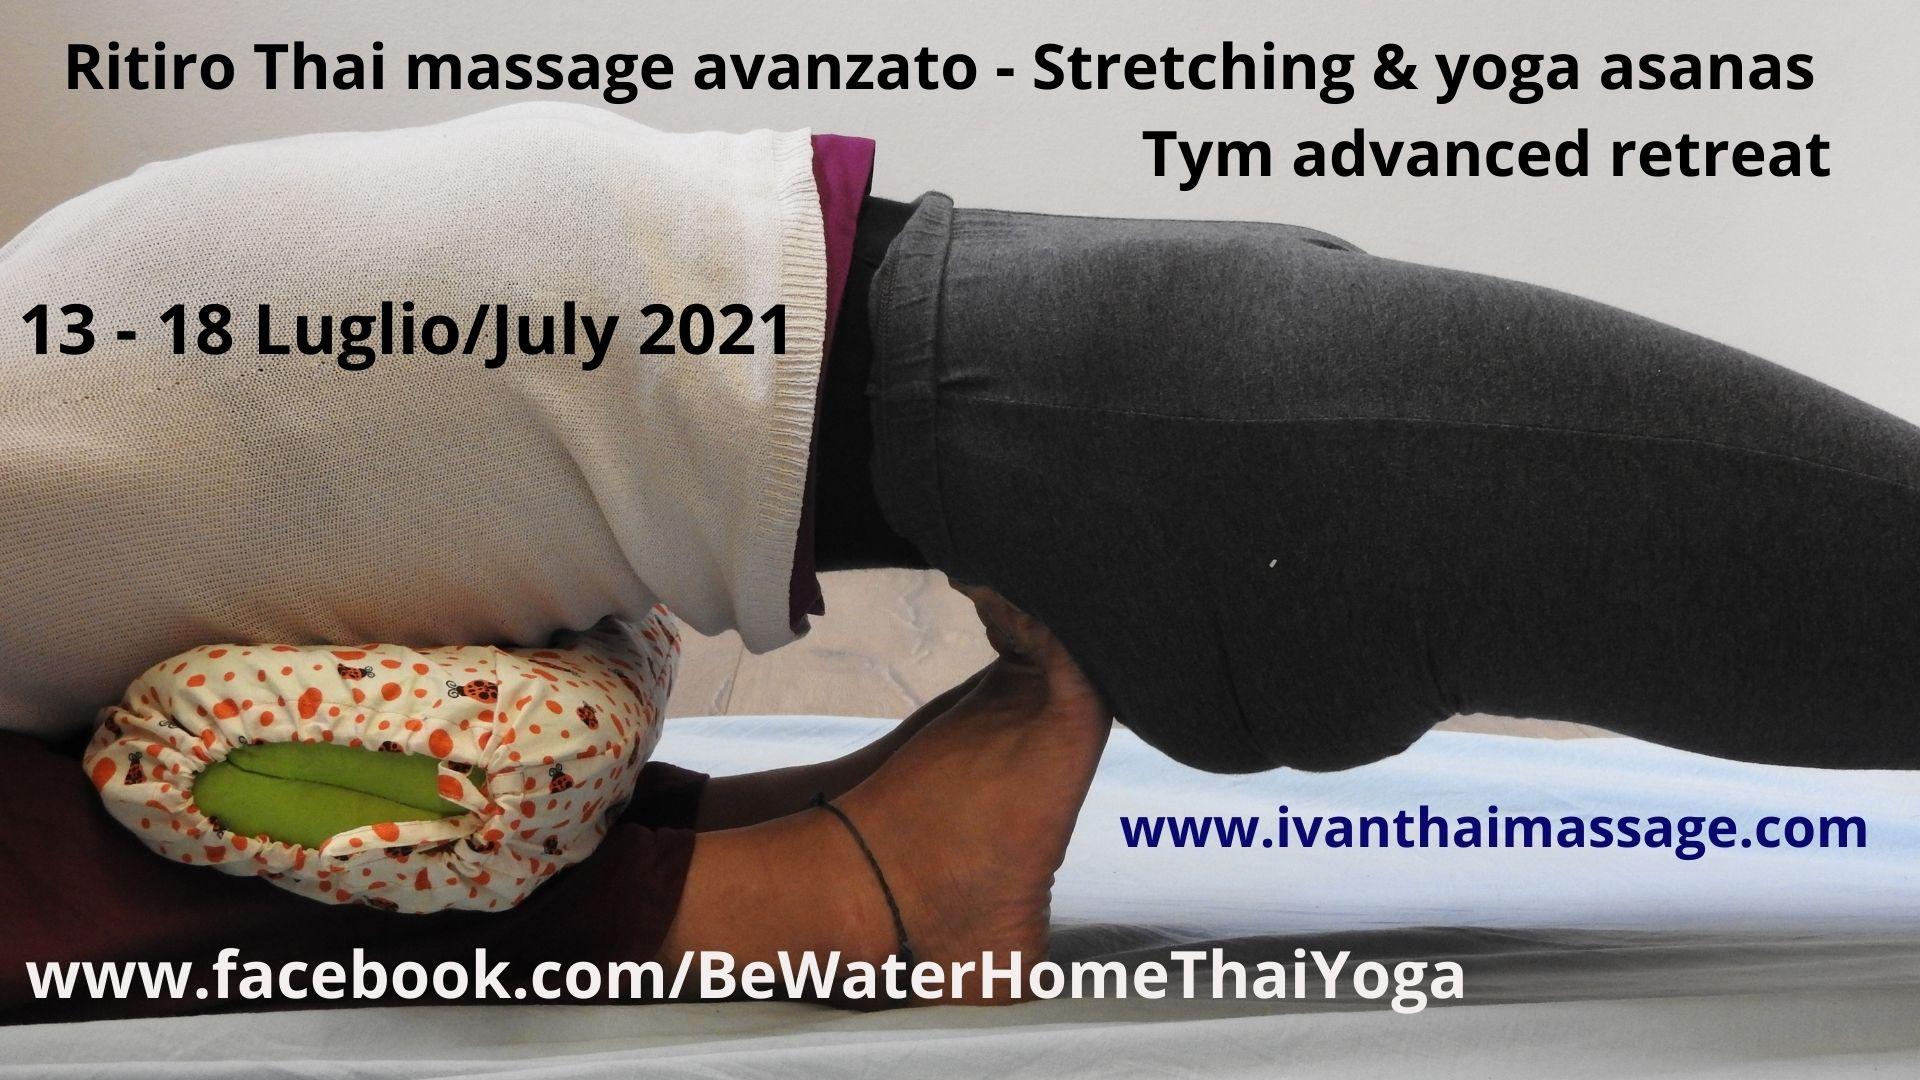 Ritiro di Thai massage Avanzato – Stretching & Yoga asanas